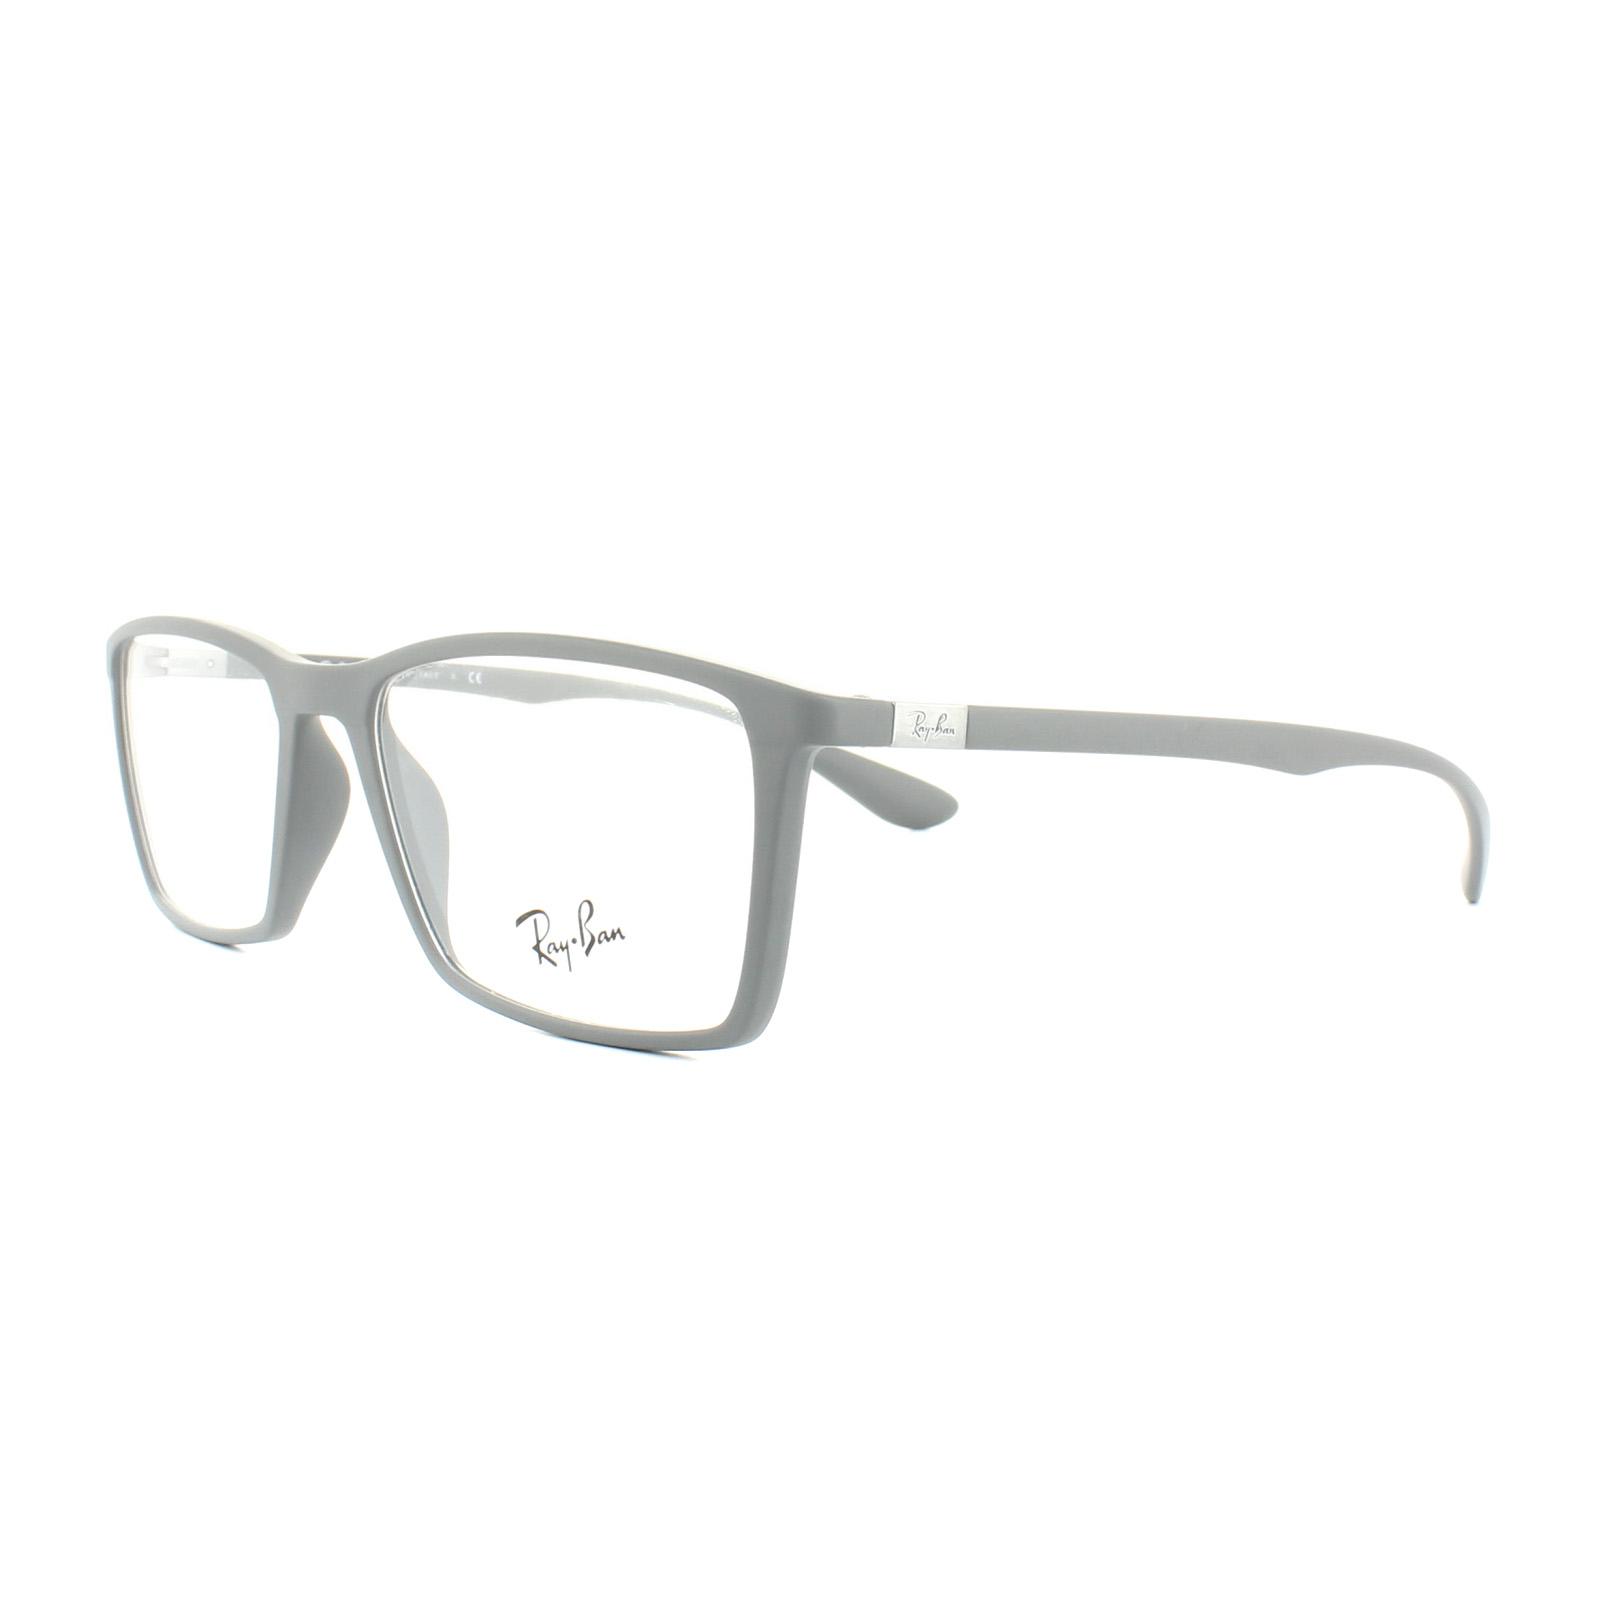 efa251e6b75 Cheap Ray-Ban RX 7049 Glasses Frames - Discounted Sunglasses